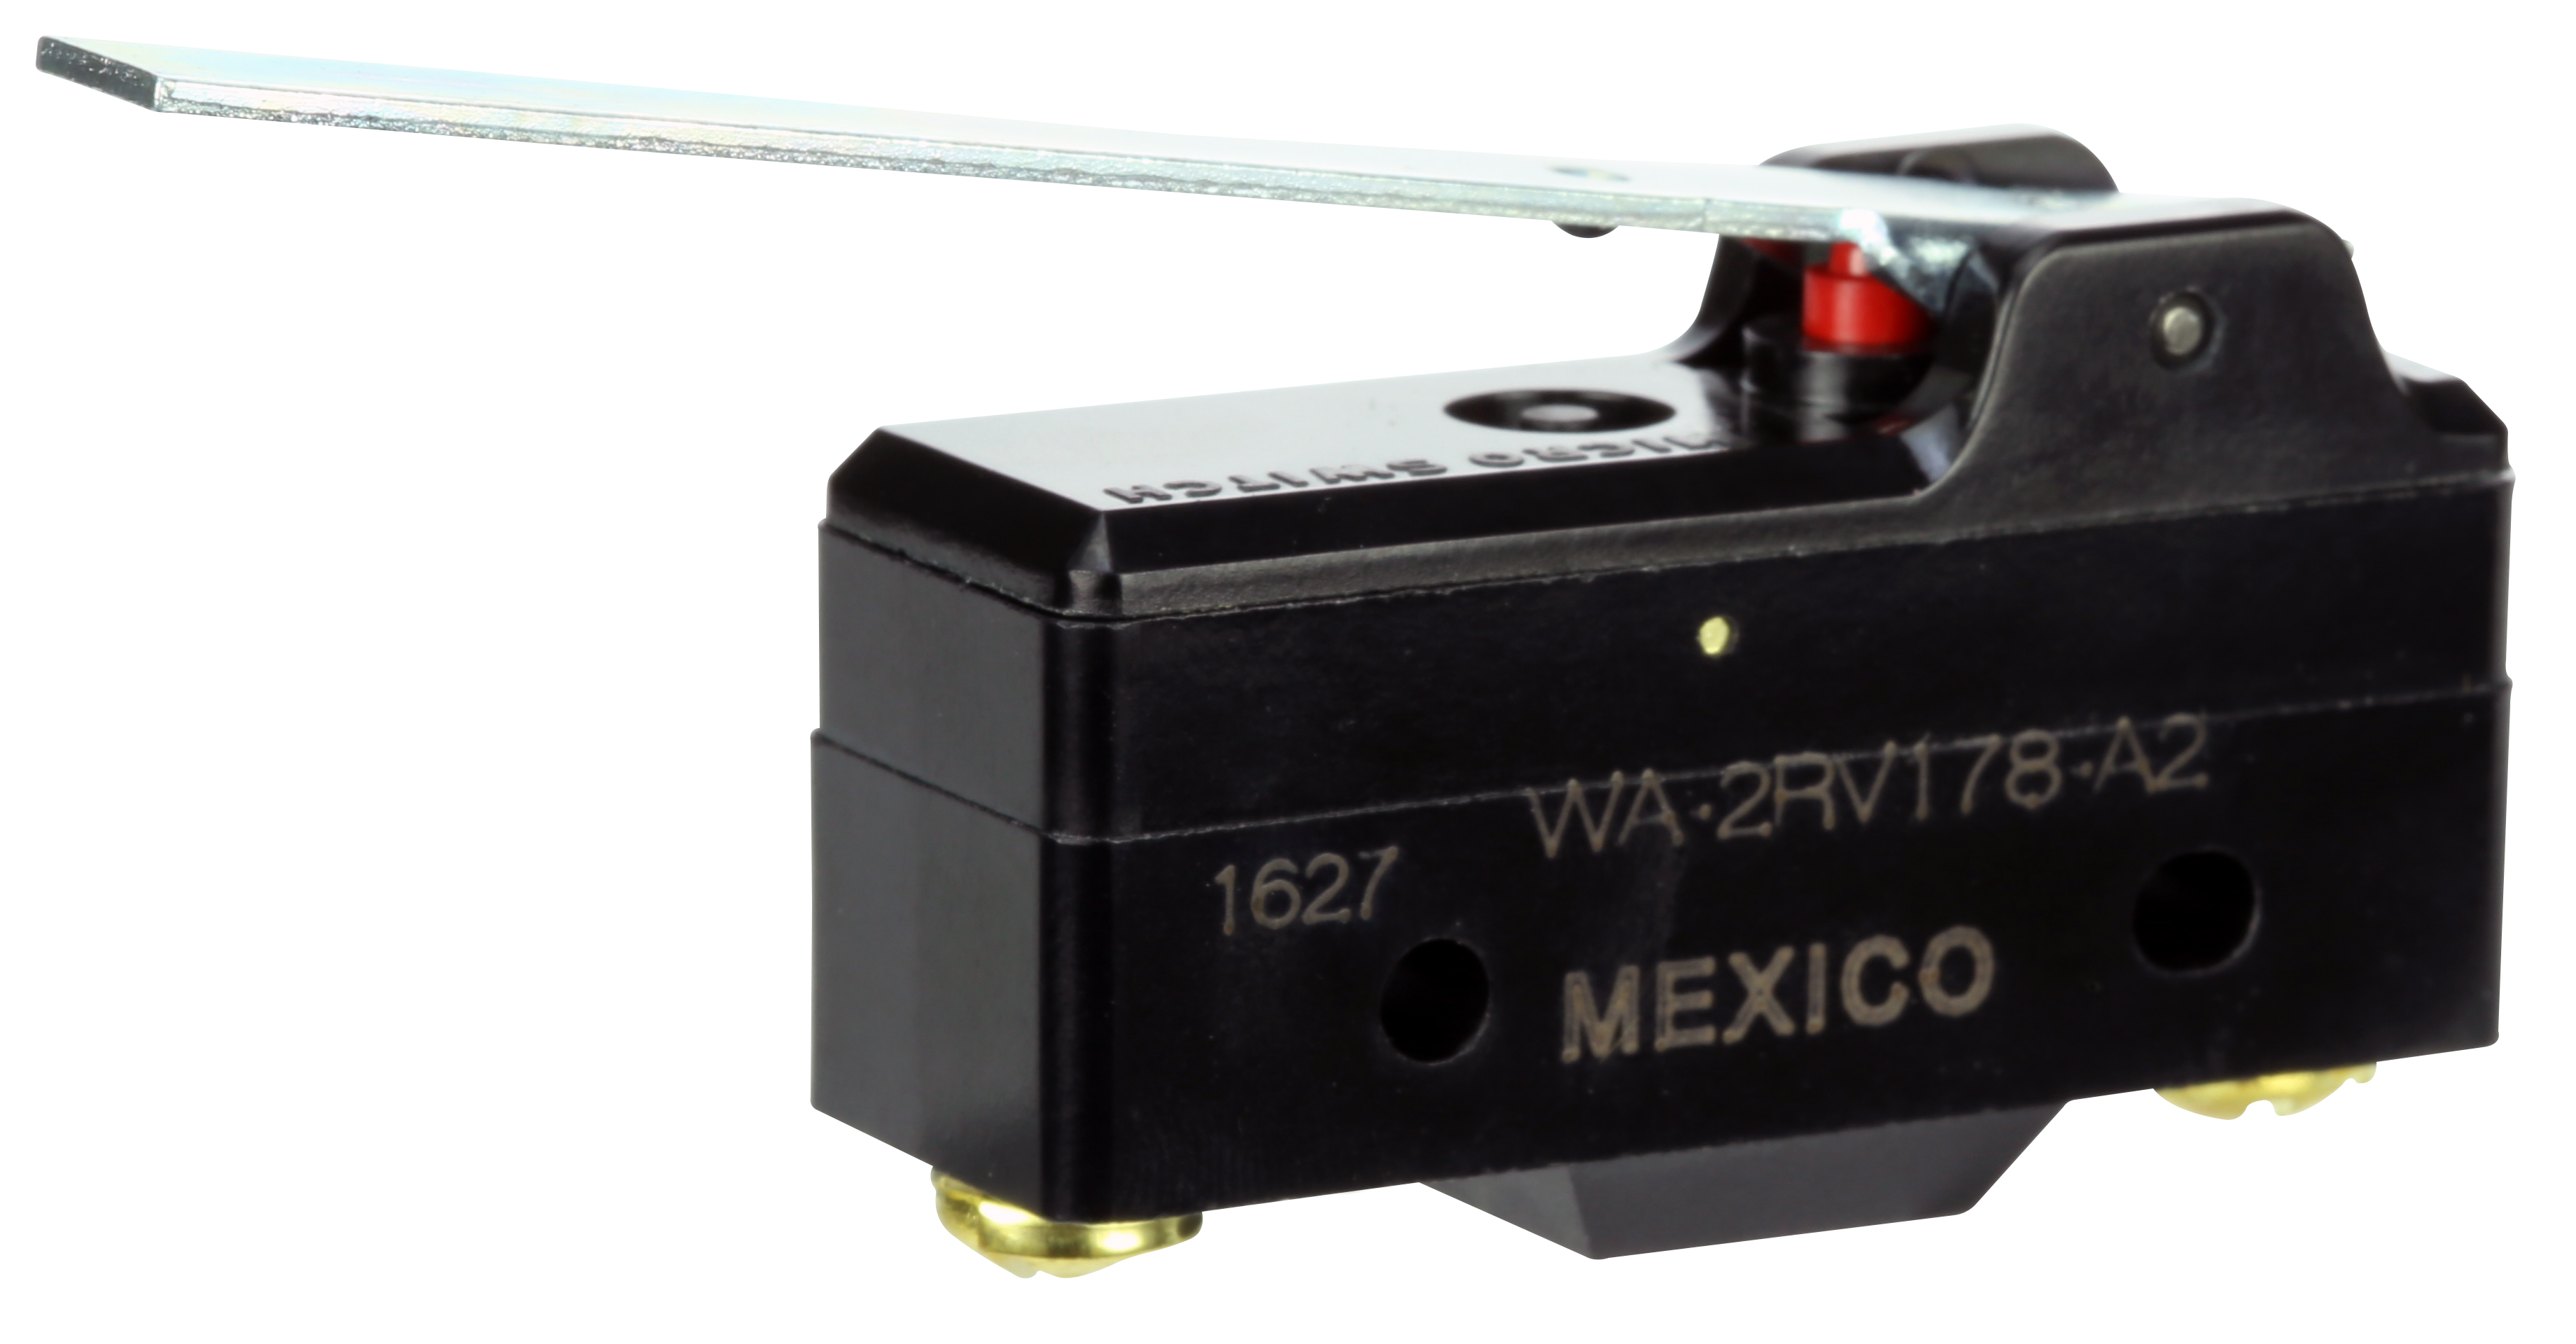 Micro Switch WA-2RV313-A22 Honeywell Switch WA-2RV313-A22